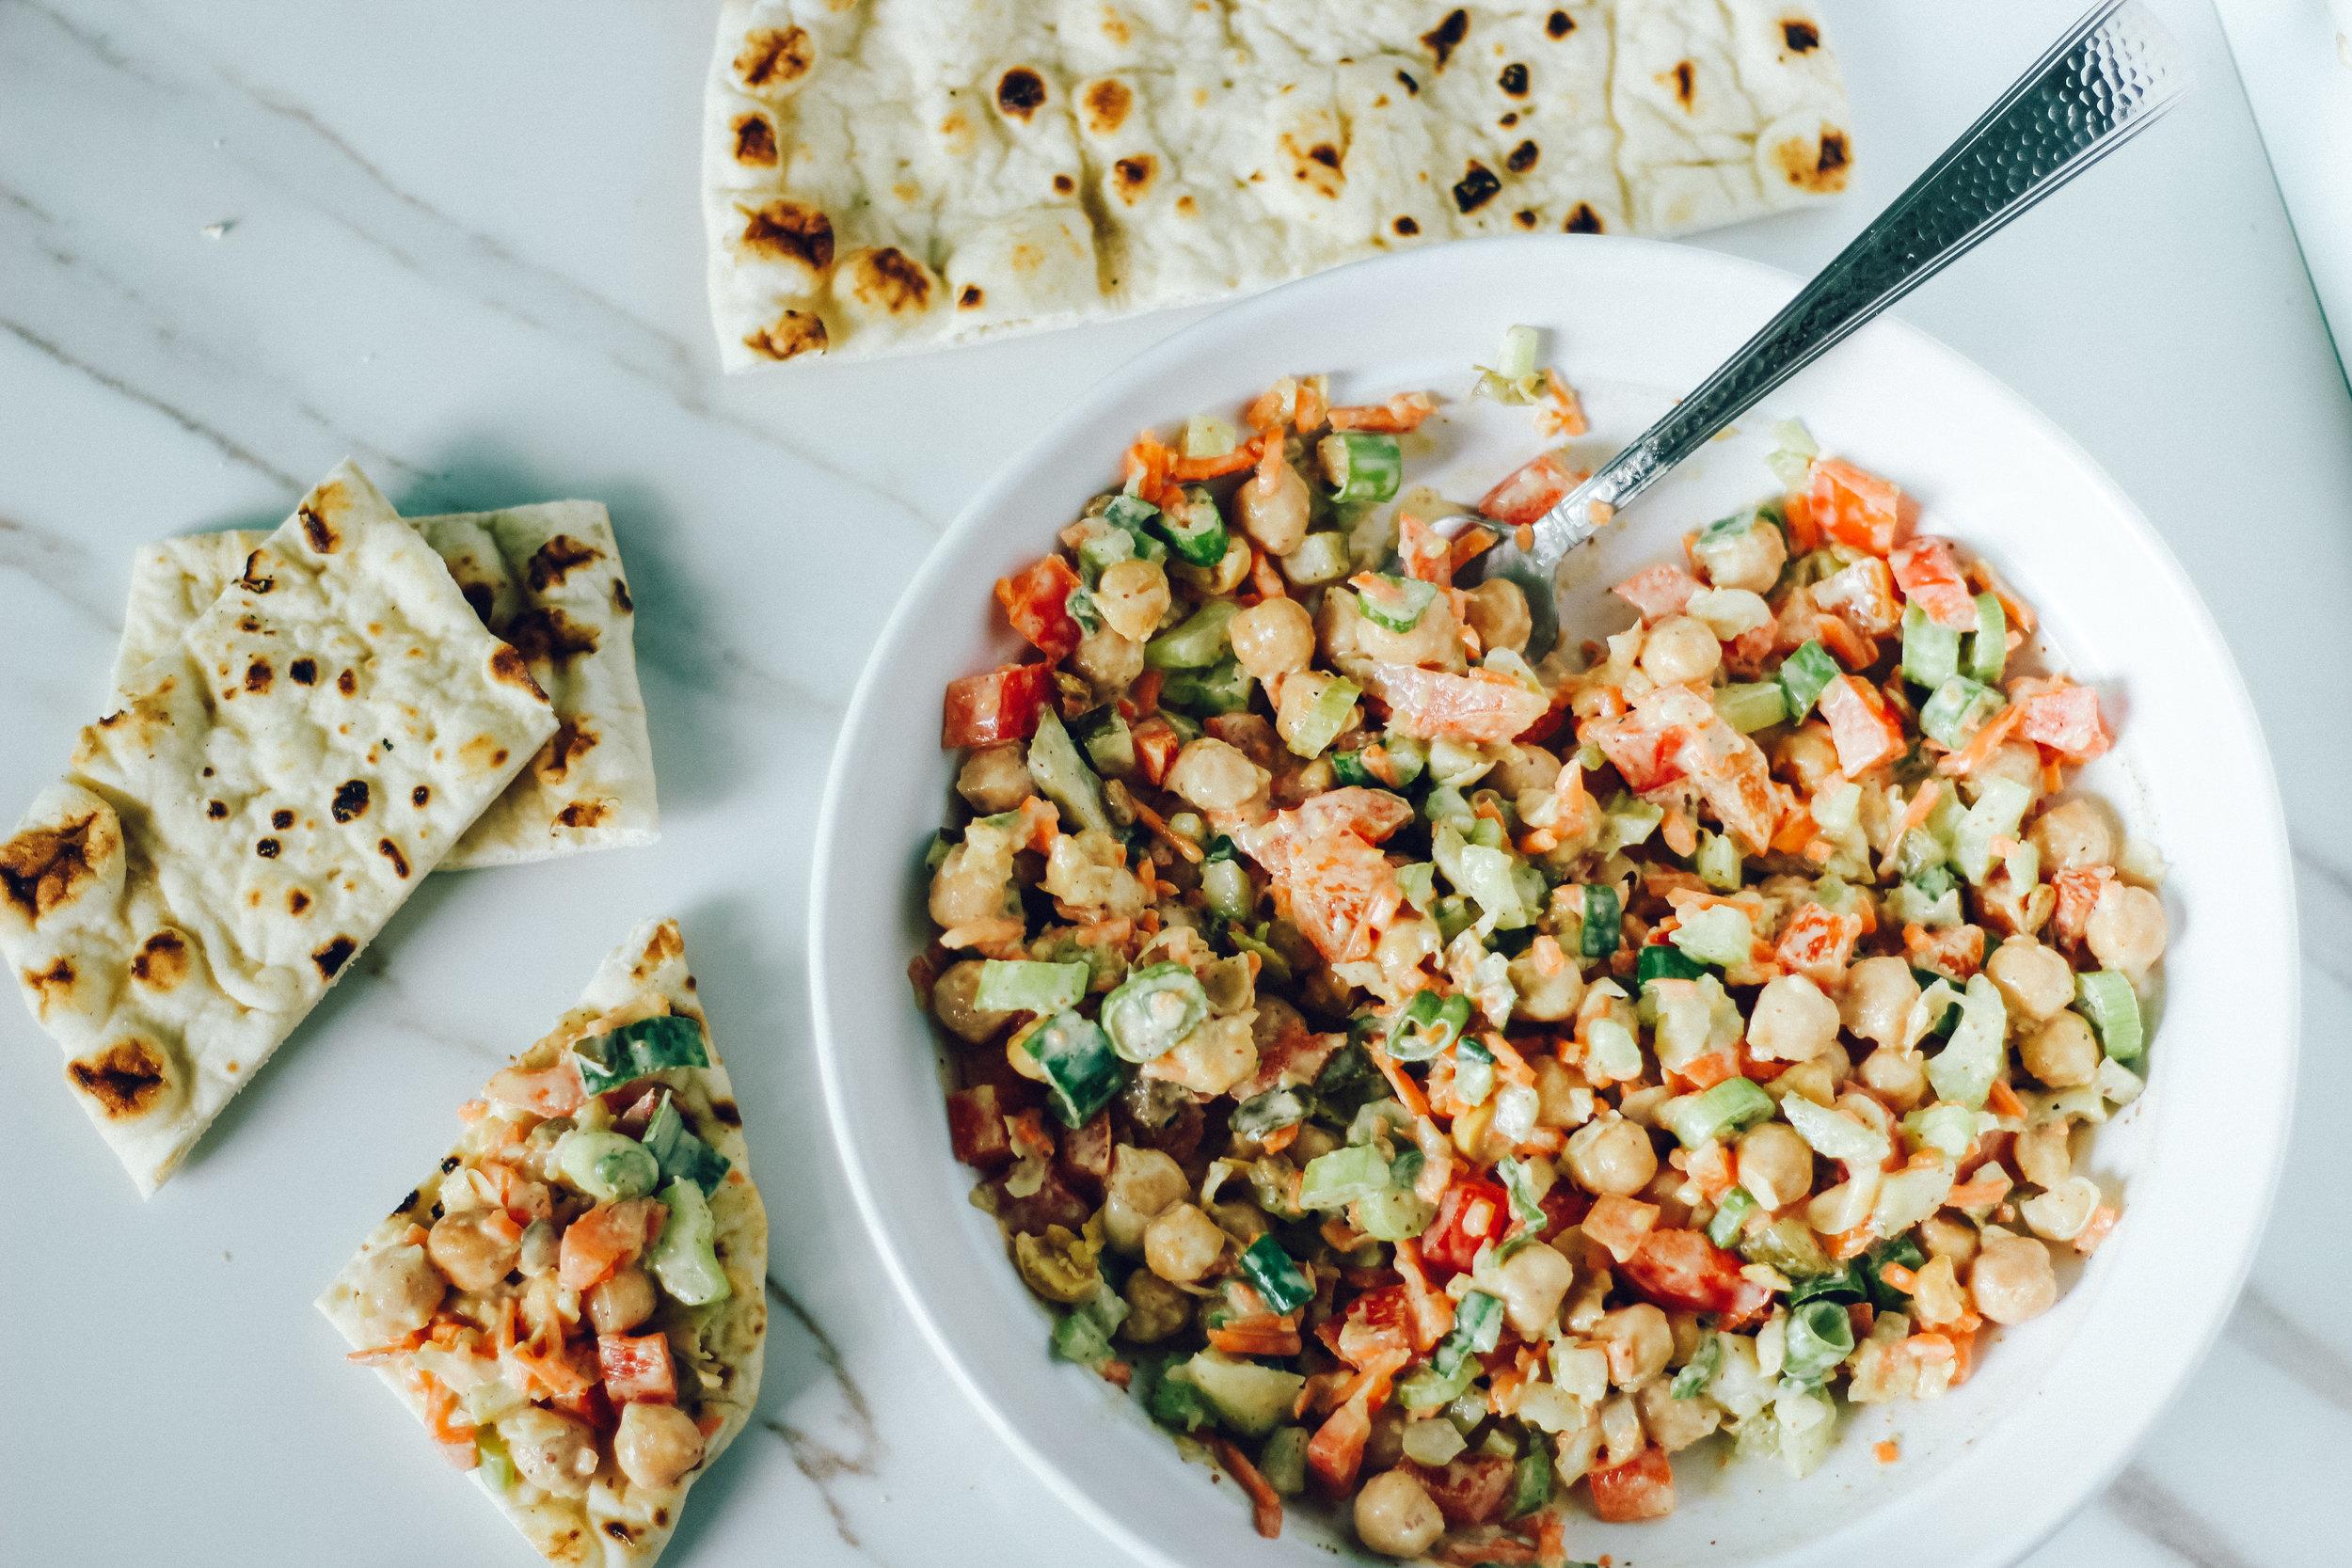 Chickpea salad meal prep 3 ways